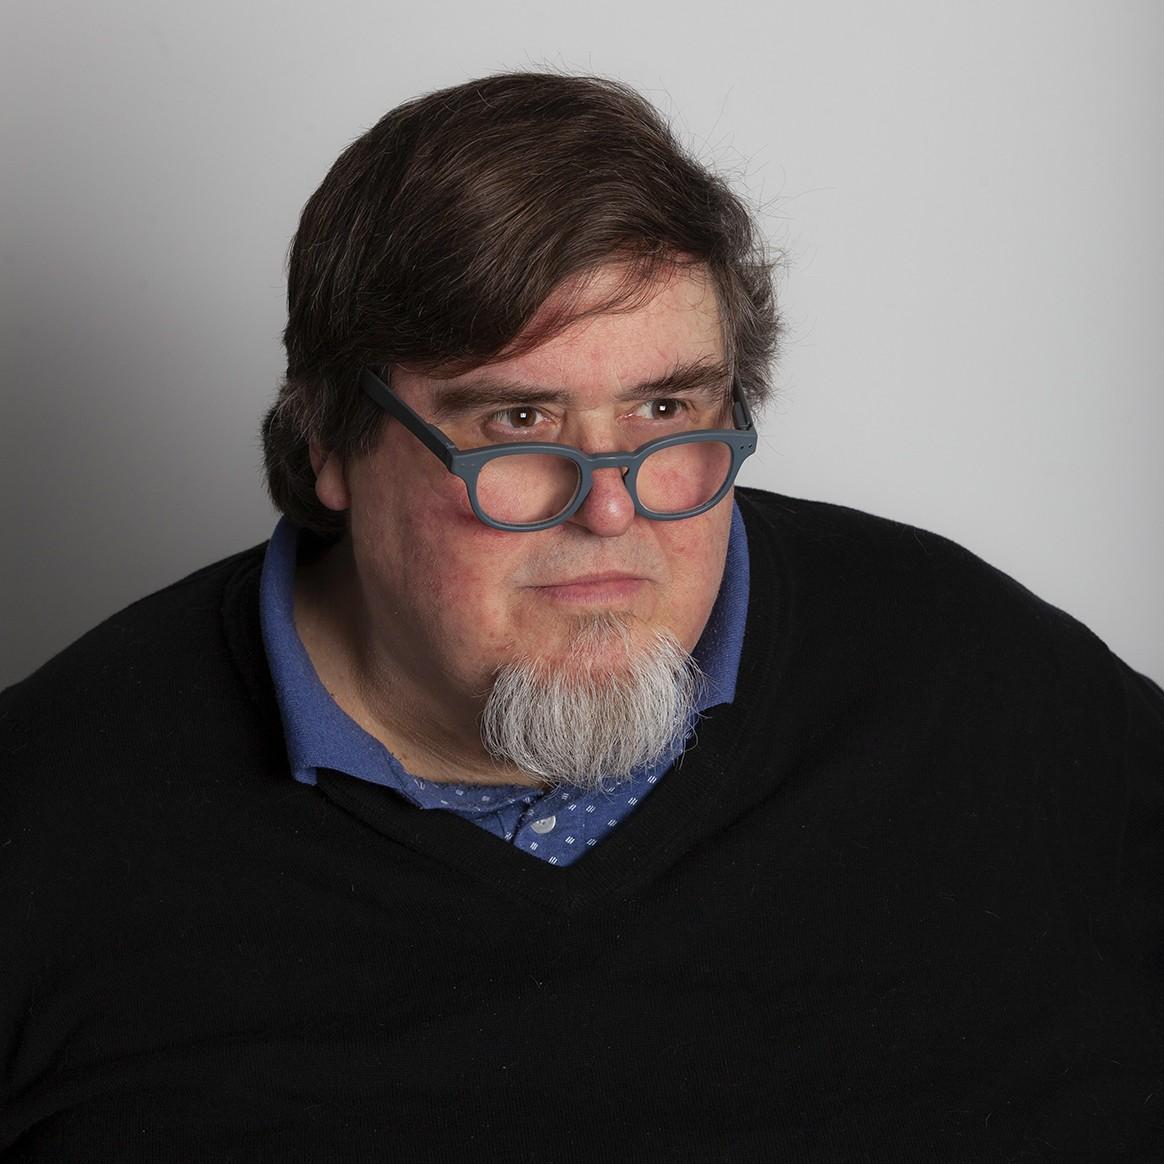 Headshot of Penn State Associate Professor of Art History Craig Zabel